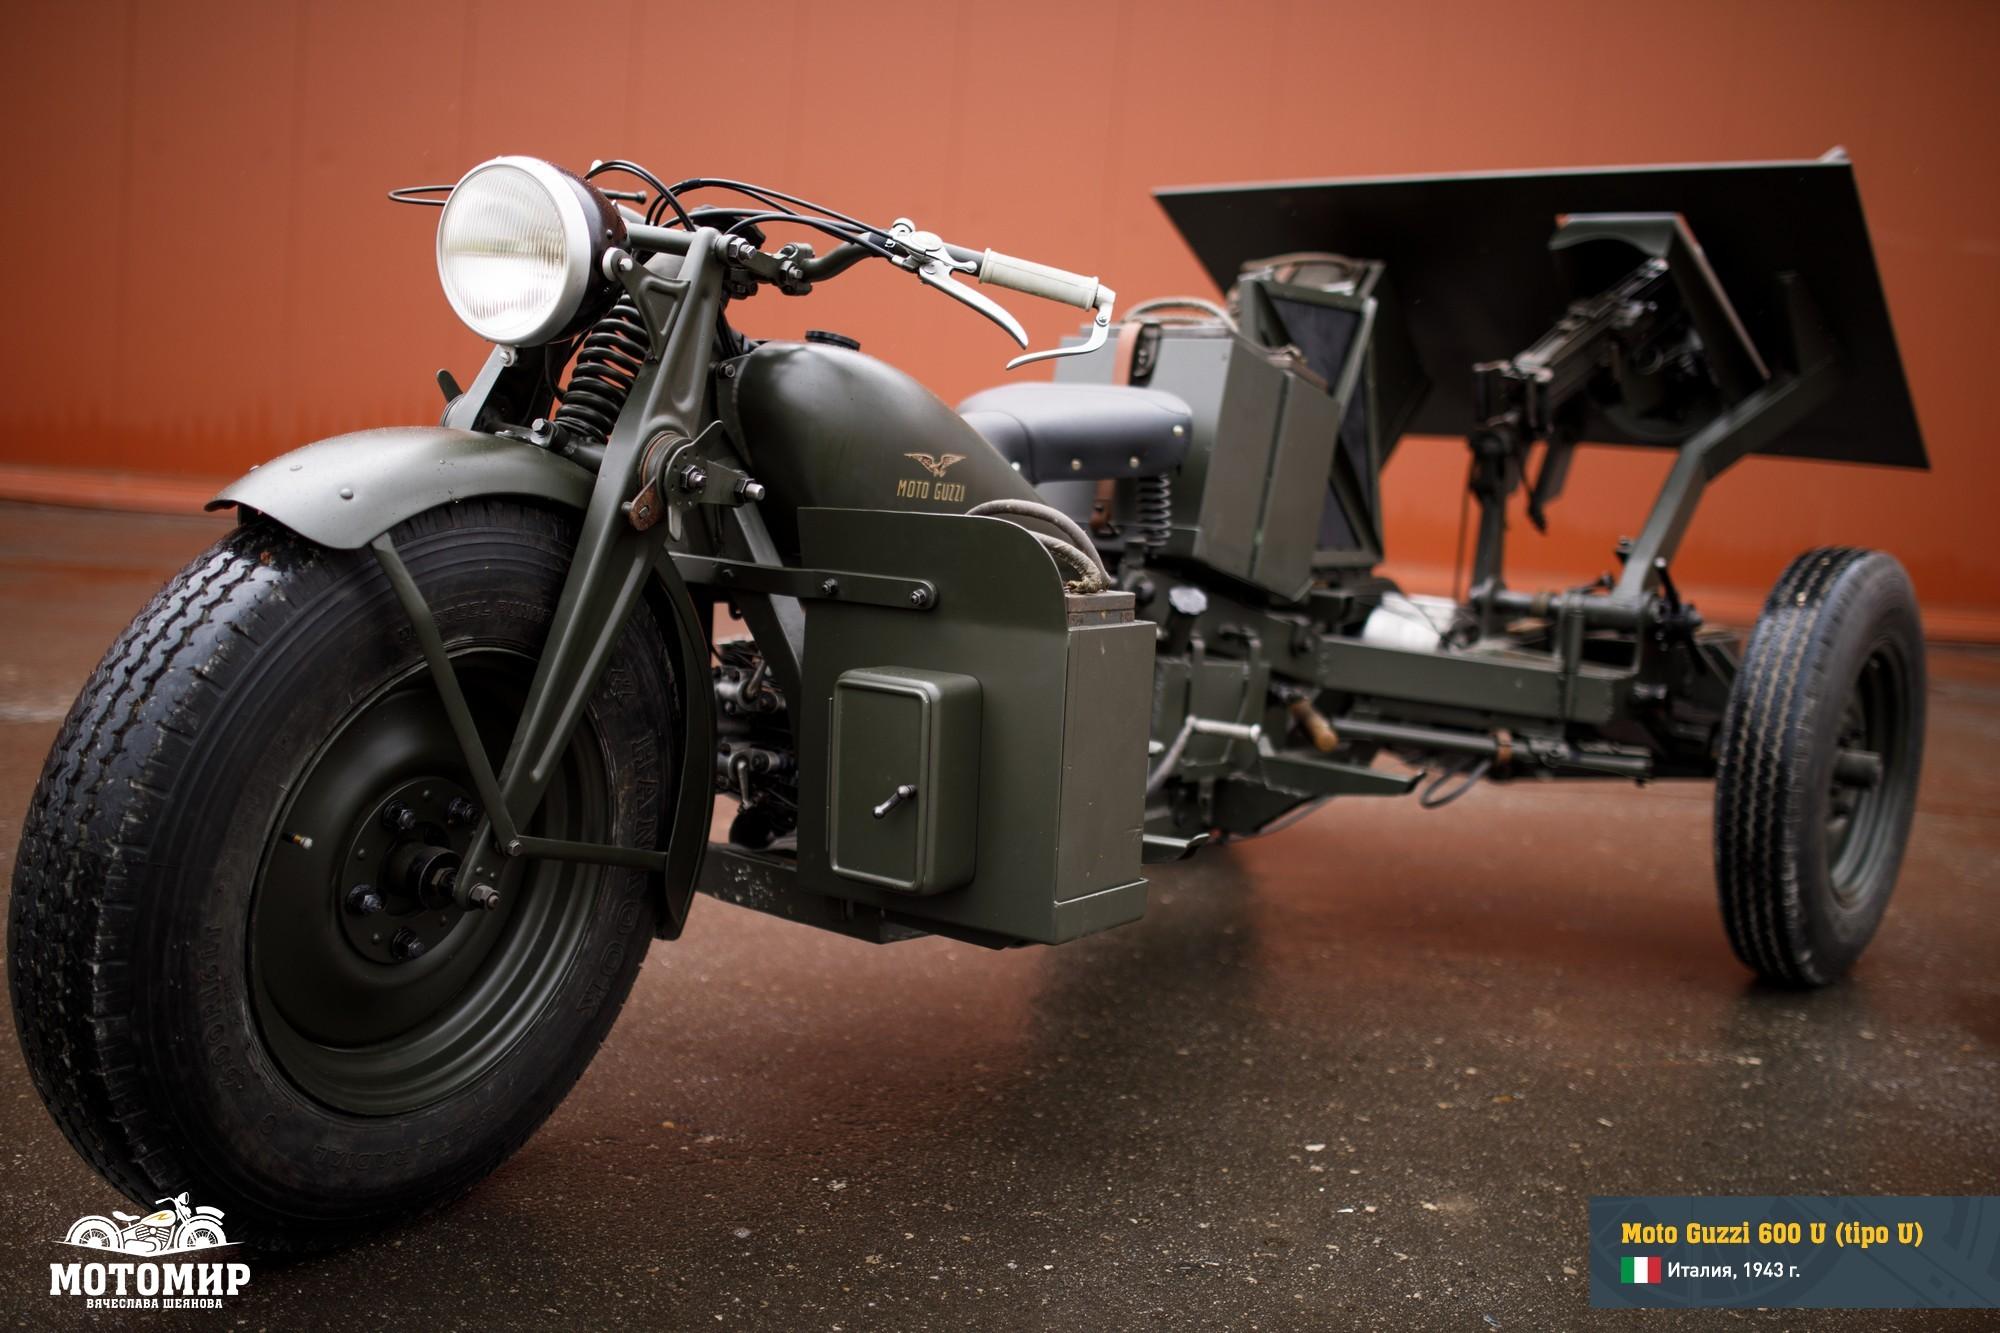 moto-guzzi-600-u-web-38